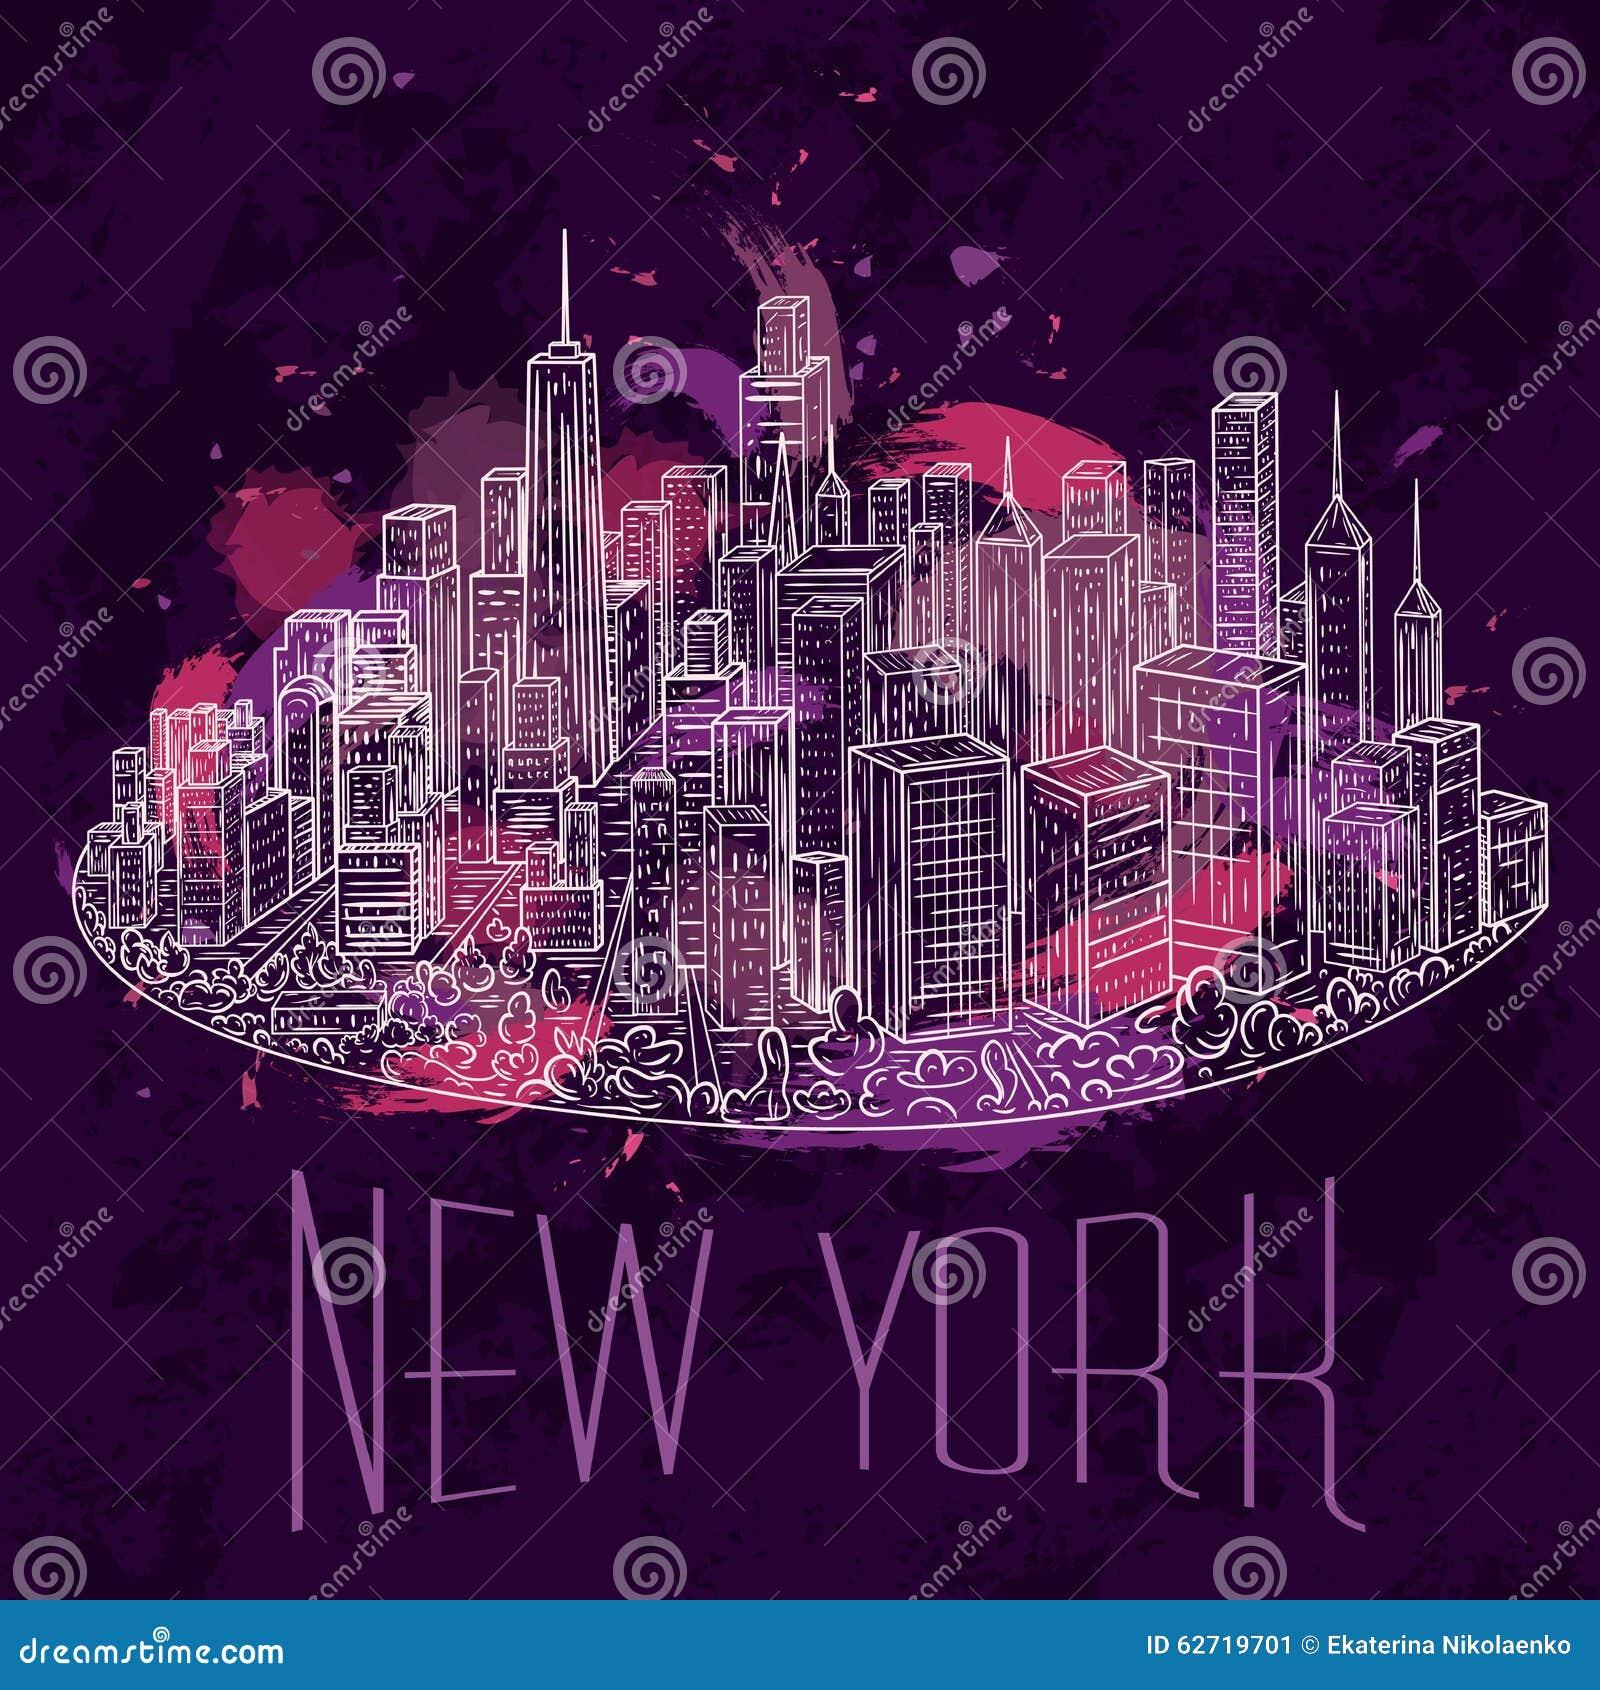 Town Landscape Vector Illustration: New York. Vintage Colorful Hand Drawn Night City Landscape